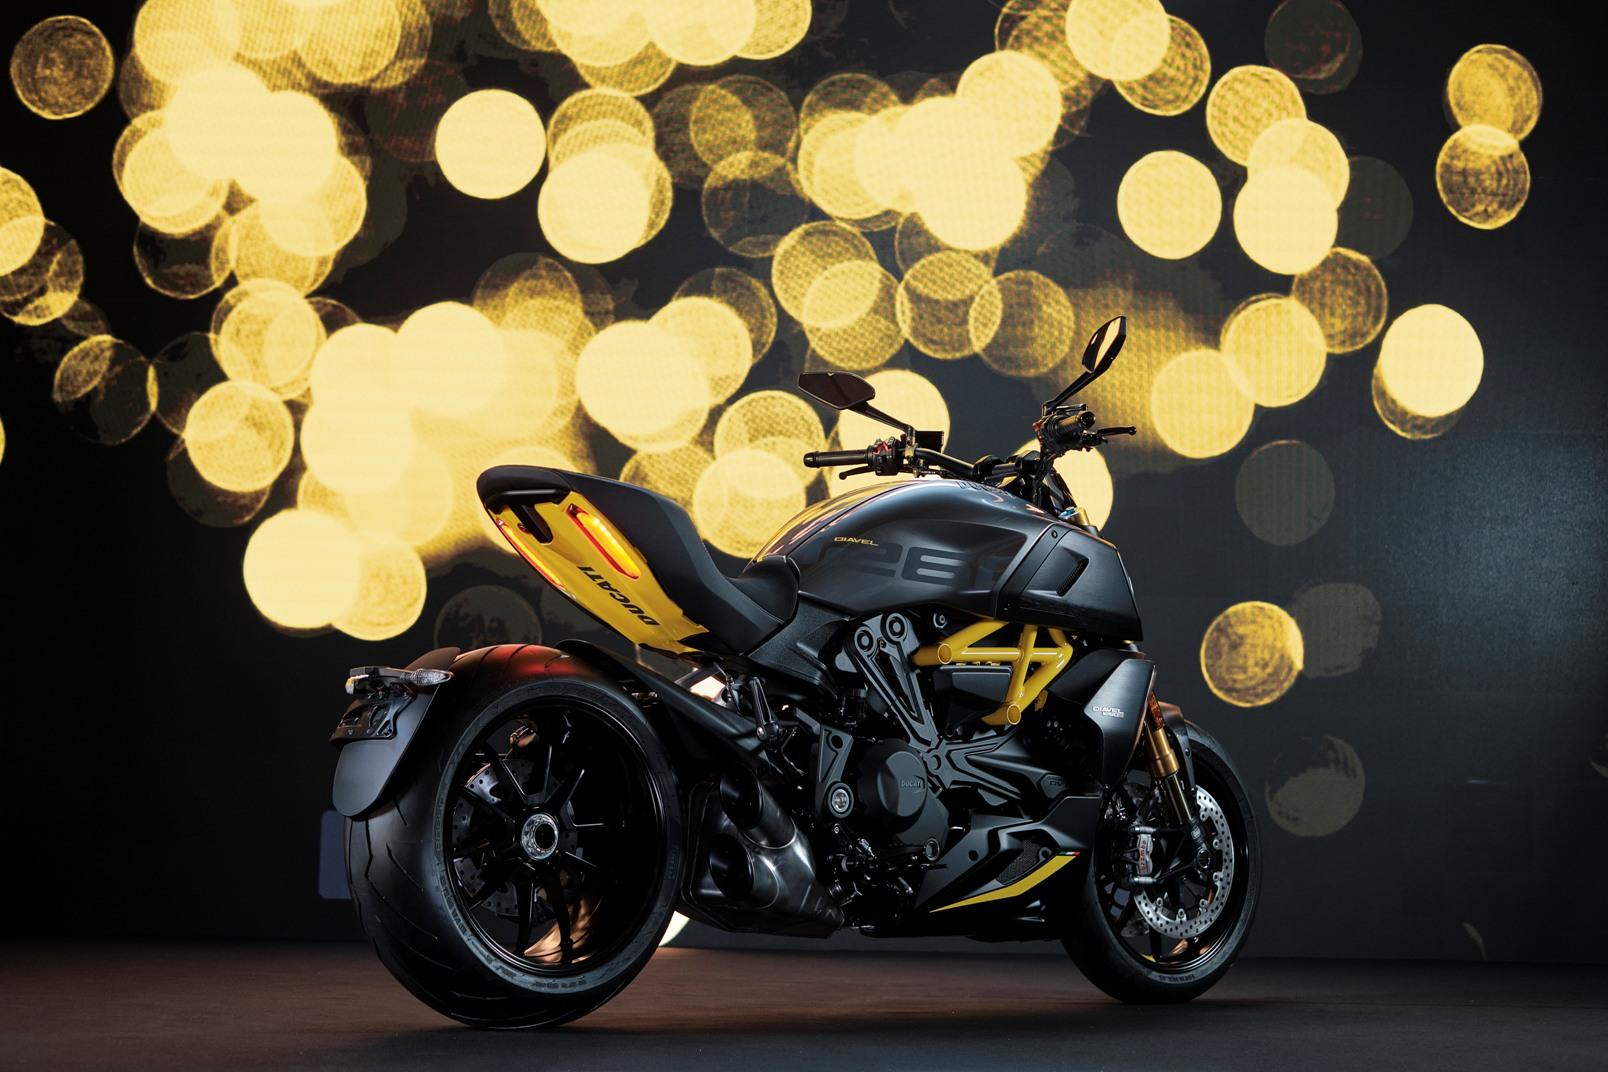 Ducati Diavel 1260 S Black And Steel (1)